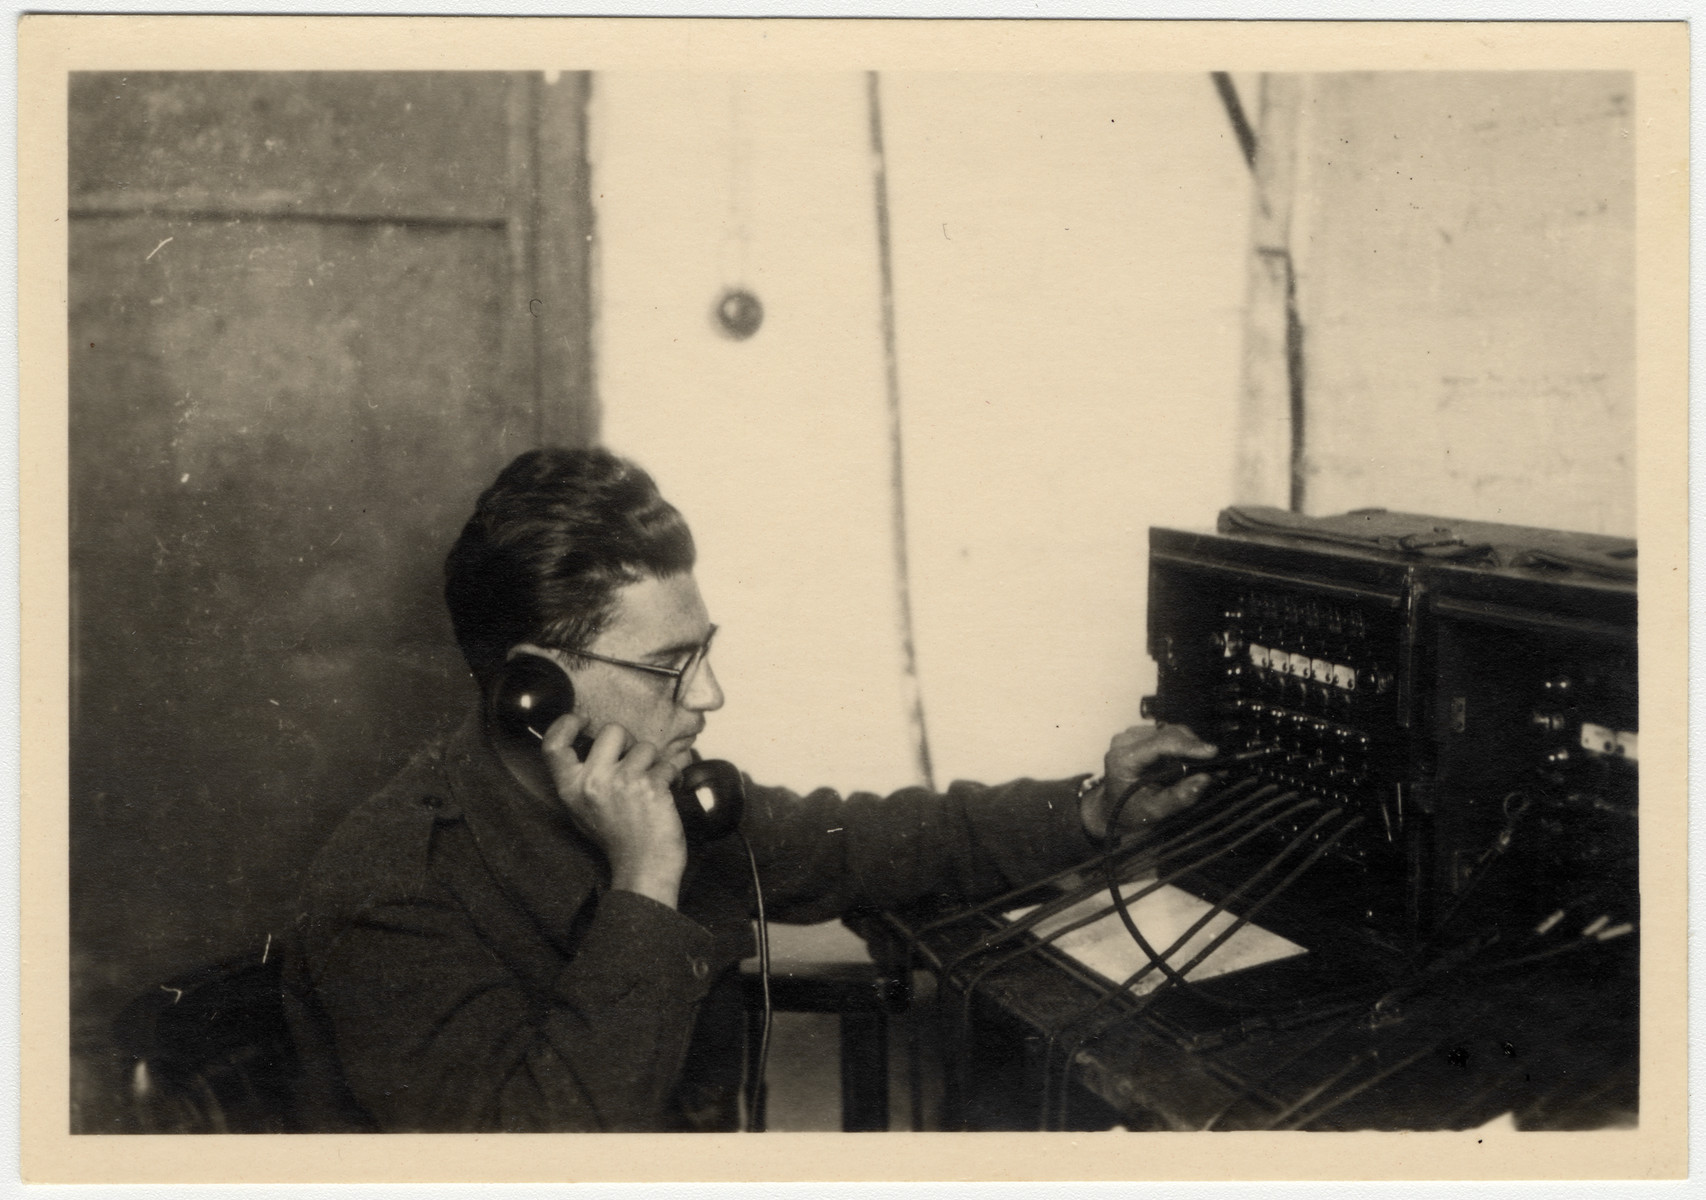 Albert Farhi operates a radio in the Israeli army.